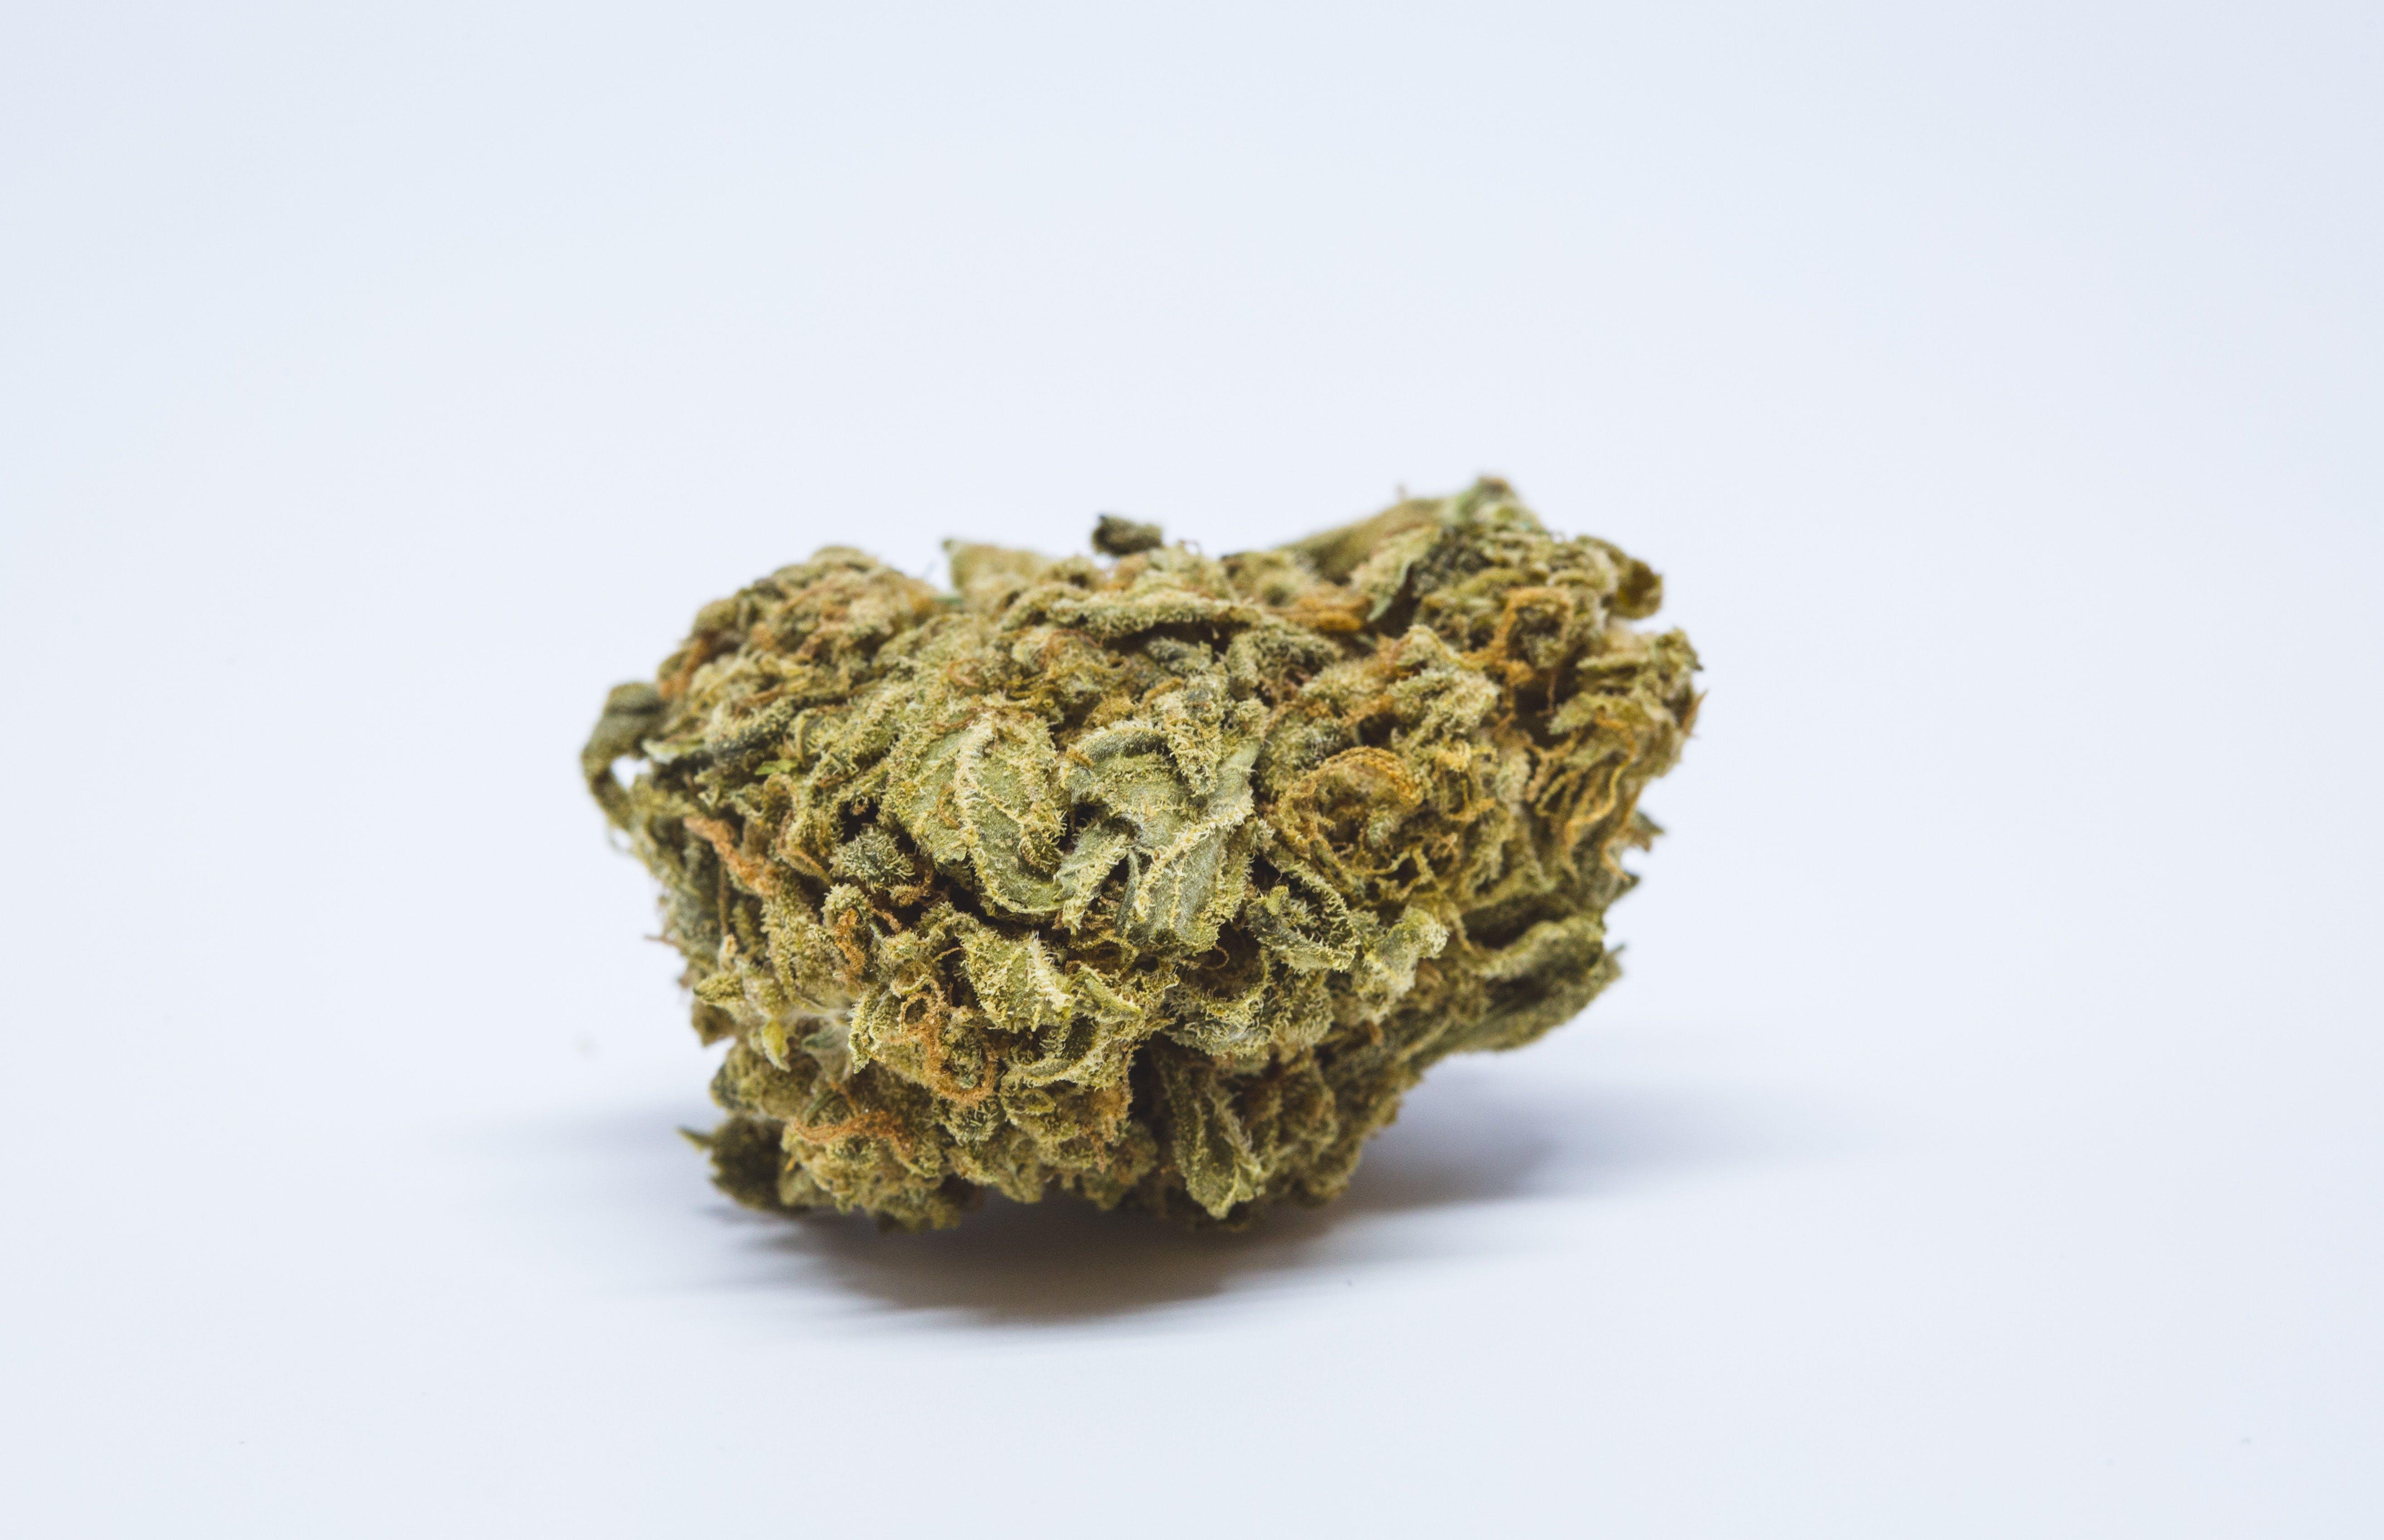 Platinum Girl Scout Cookies Weed: Platinum Girl Scout Cookies Cannabis Strain; Platinum Girl Scout Cookies Hybrid Marijuana Strain